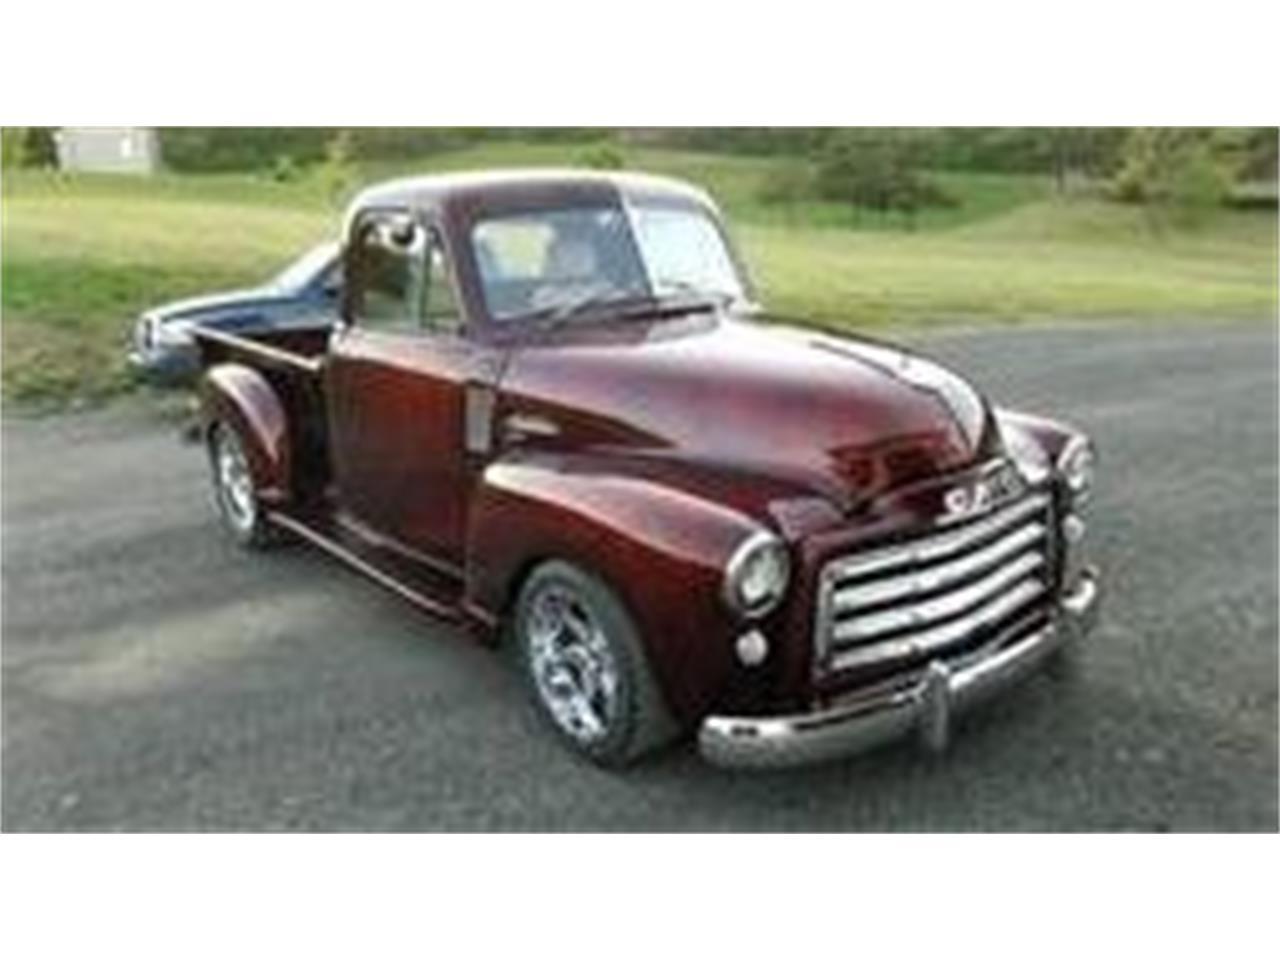 1950 Gmc Pickup For Sale Classiccars Com Cc 1123917